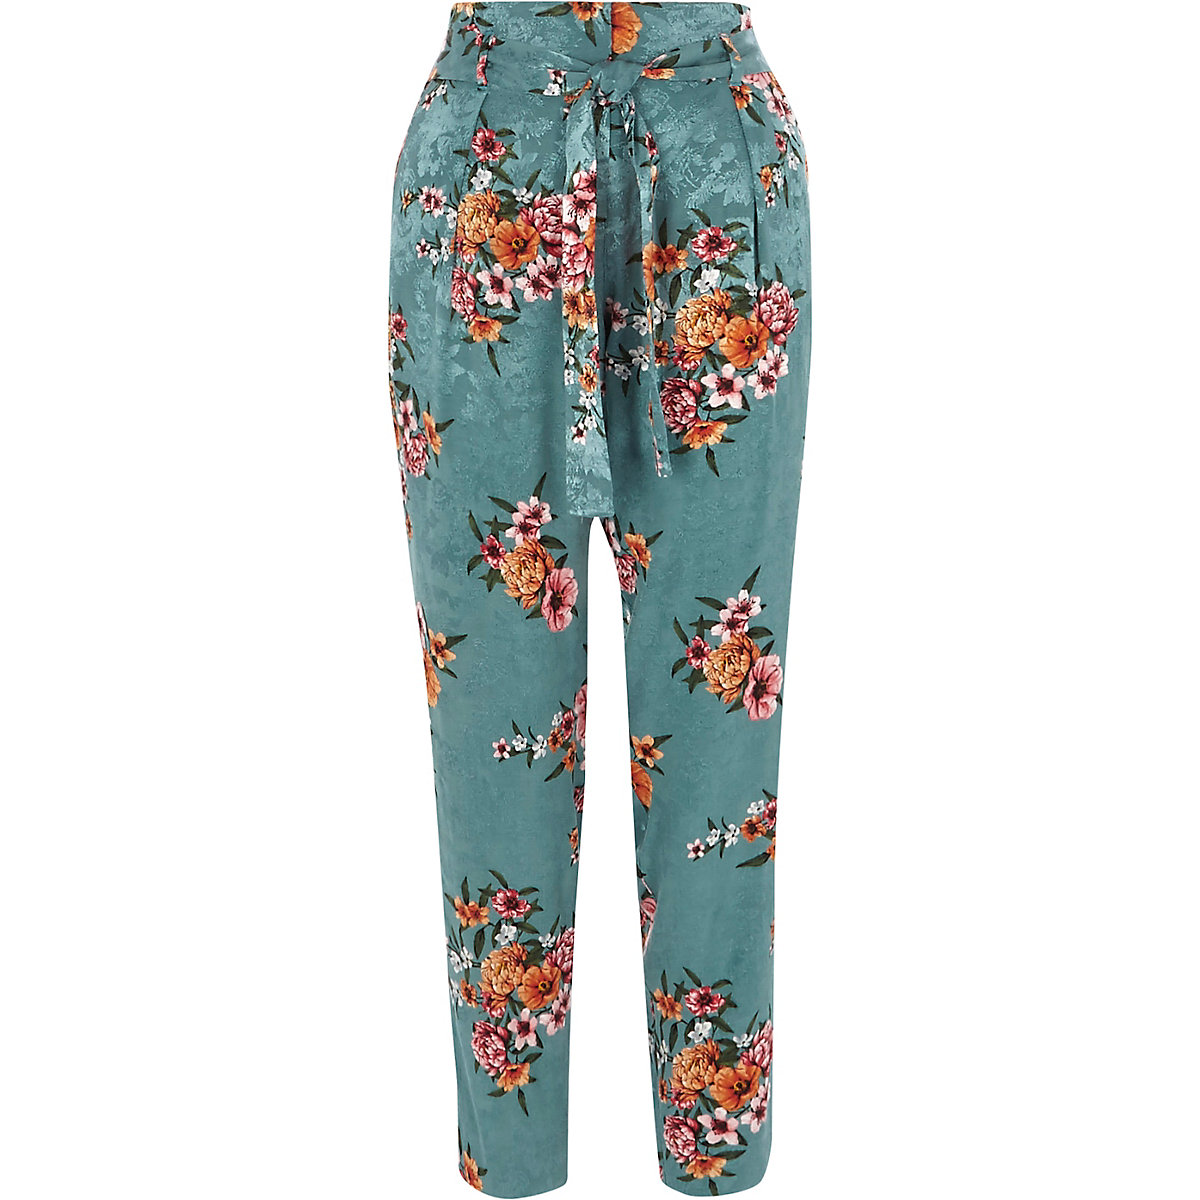 Teal blue floral jacquard tapered pants